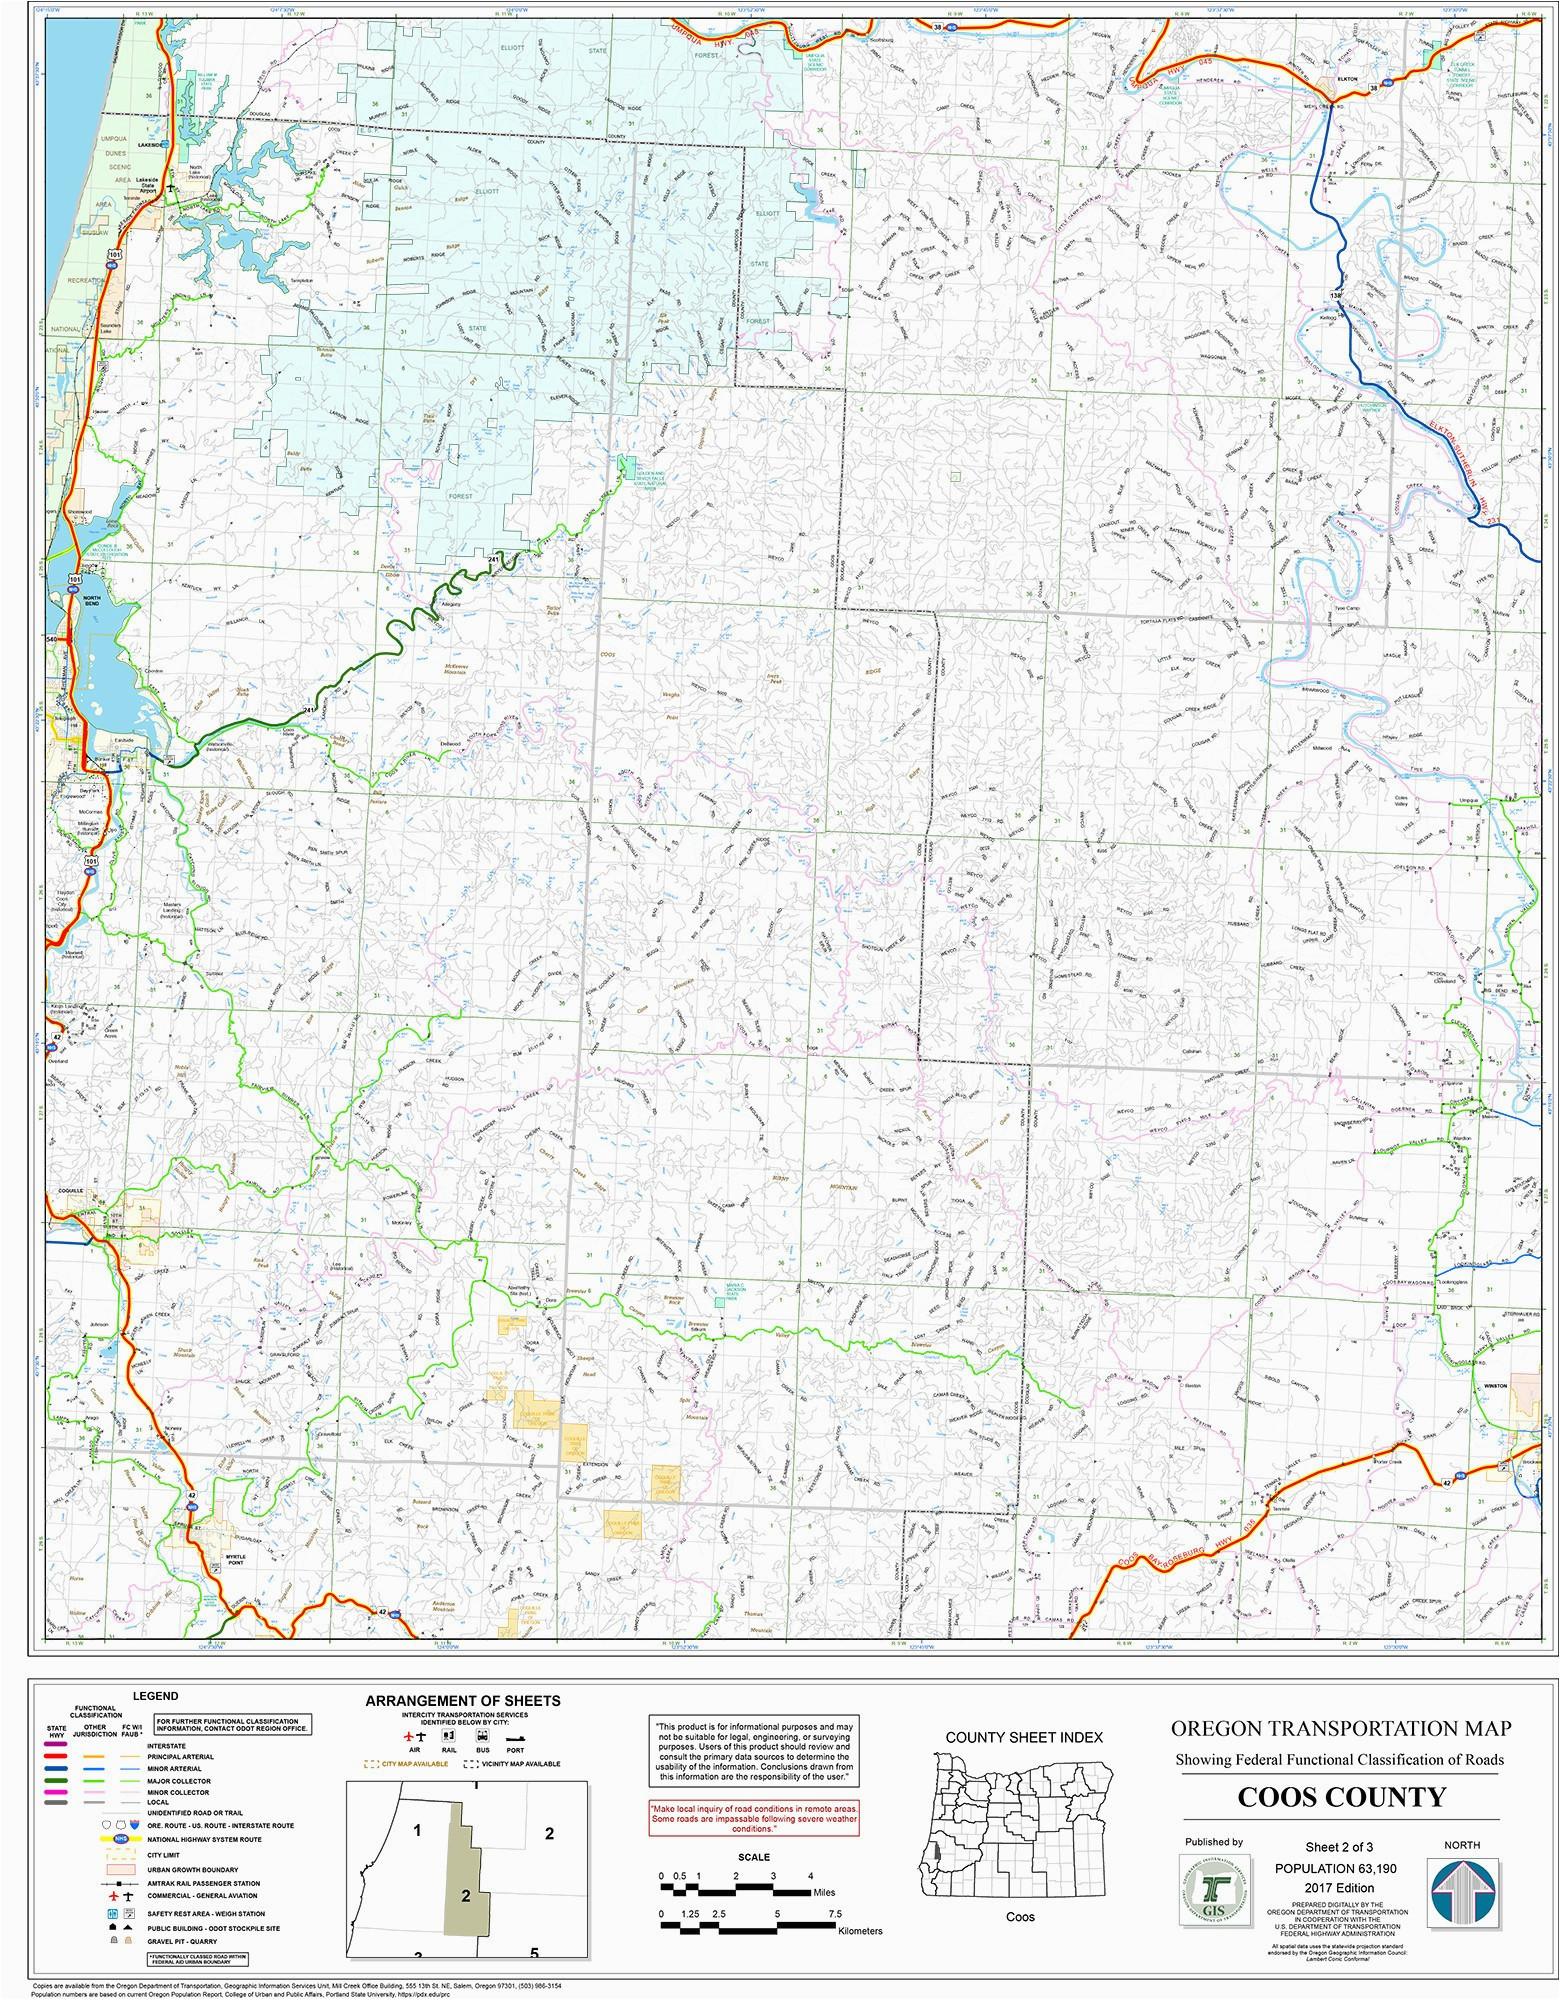 Road Map Of Dallas Texas.Dallas Texas Google Maps Google Maps Topography Maps Driving